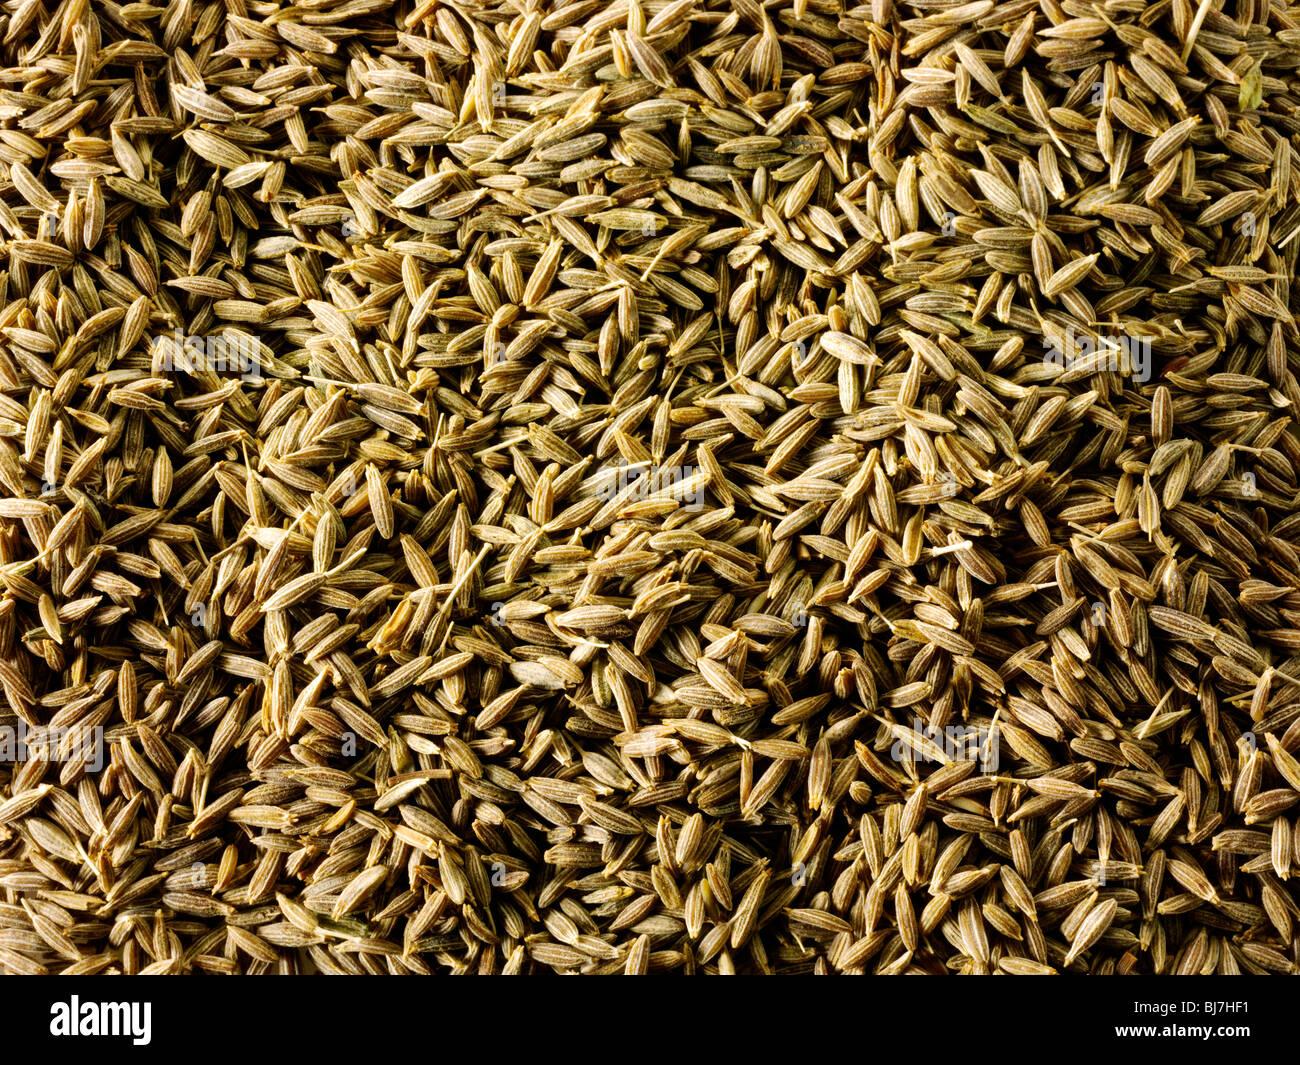 Les graines de cumin entier, Close up full frame Photo Stock